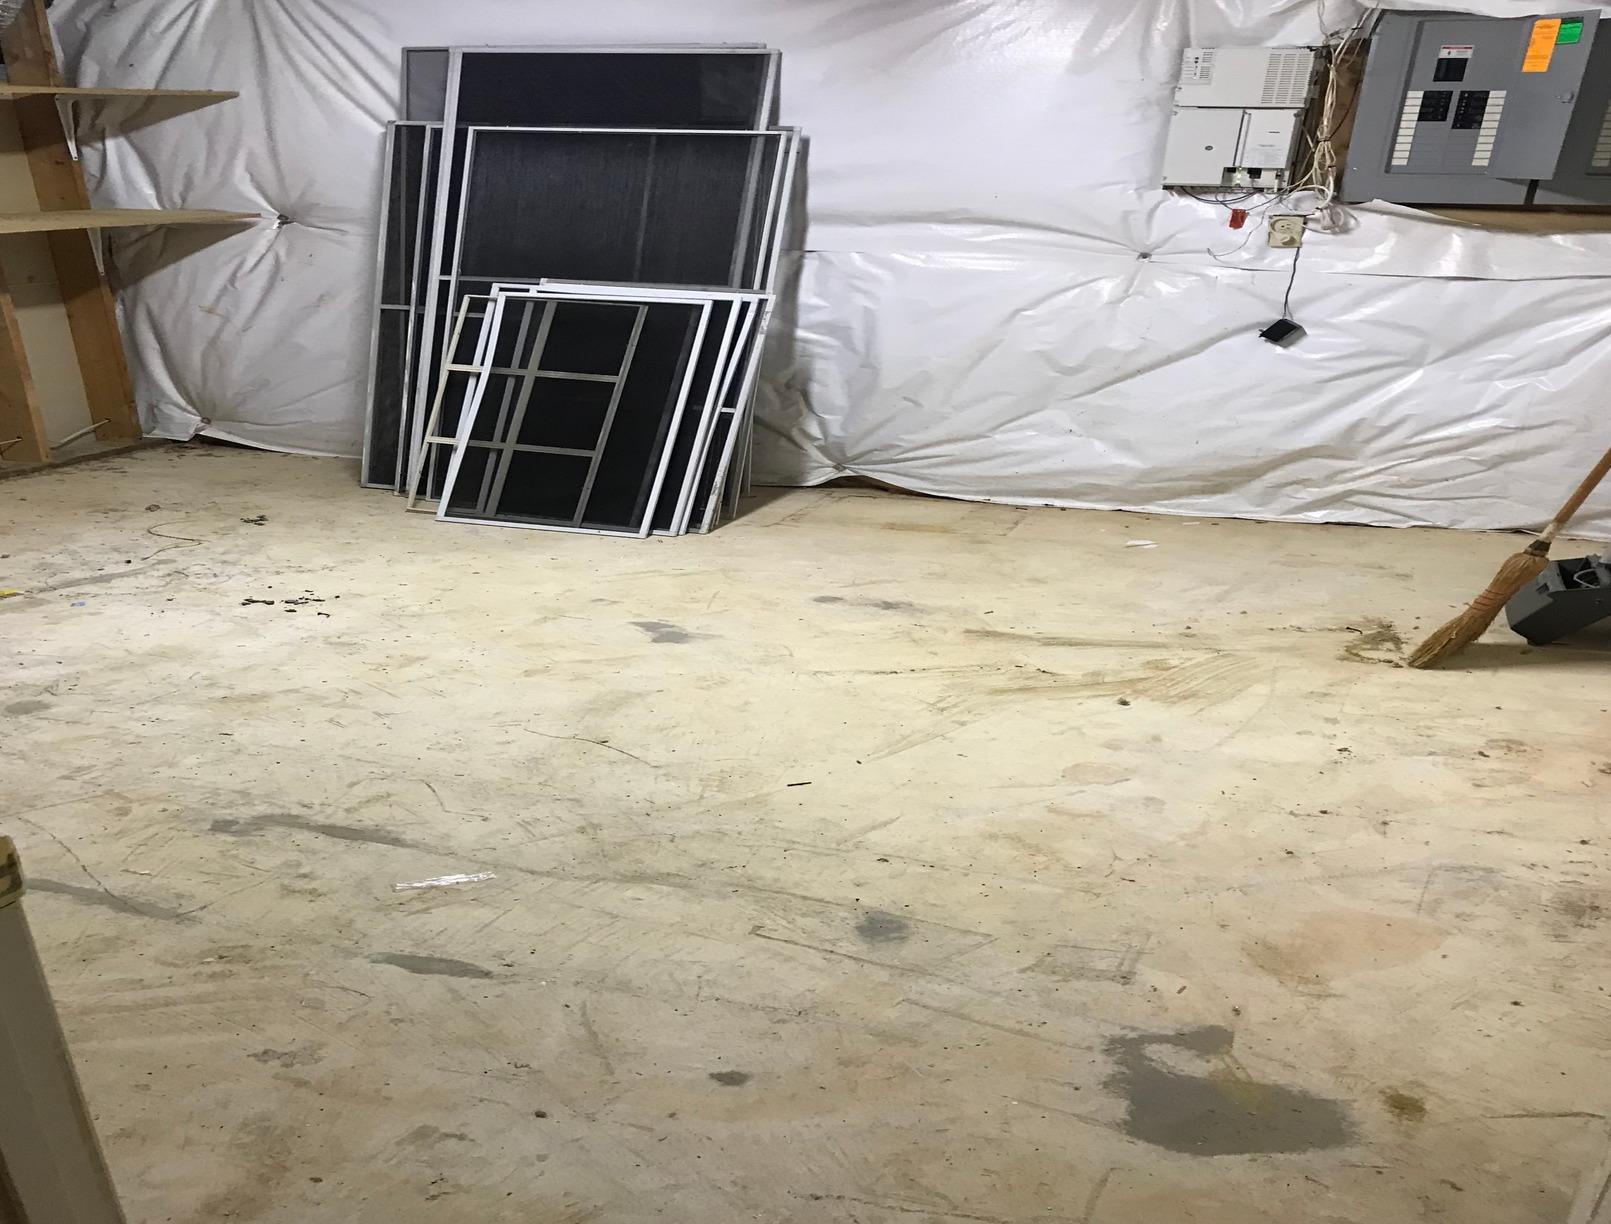 Basement clean out, Ellicott City MD. - After Photo